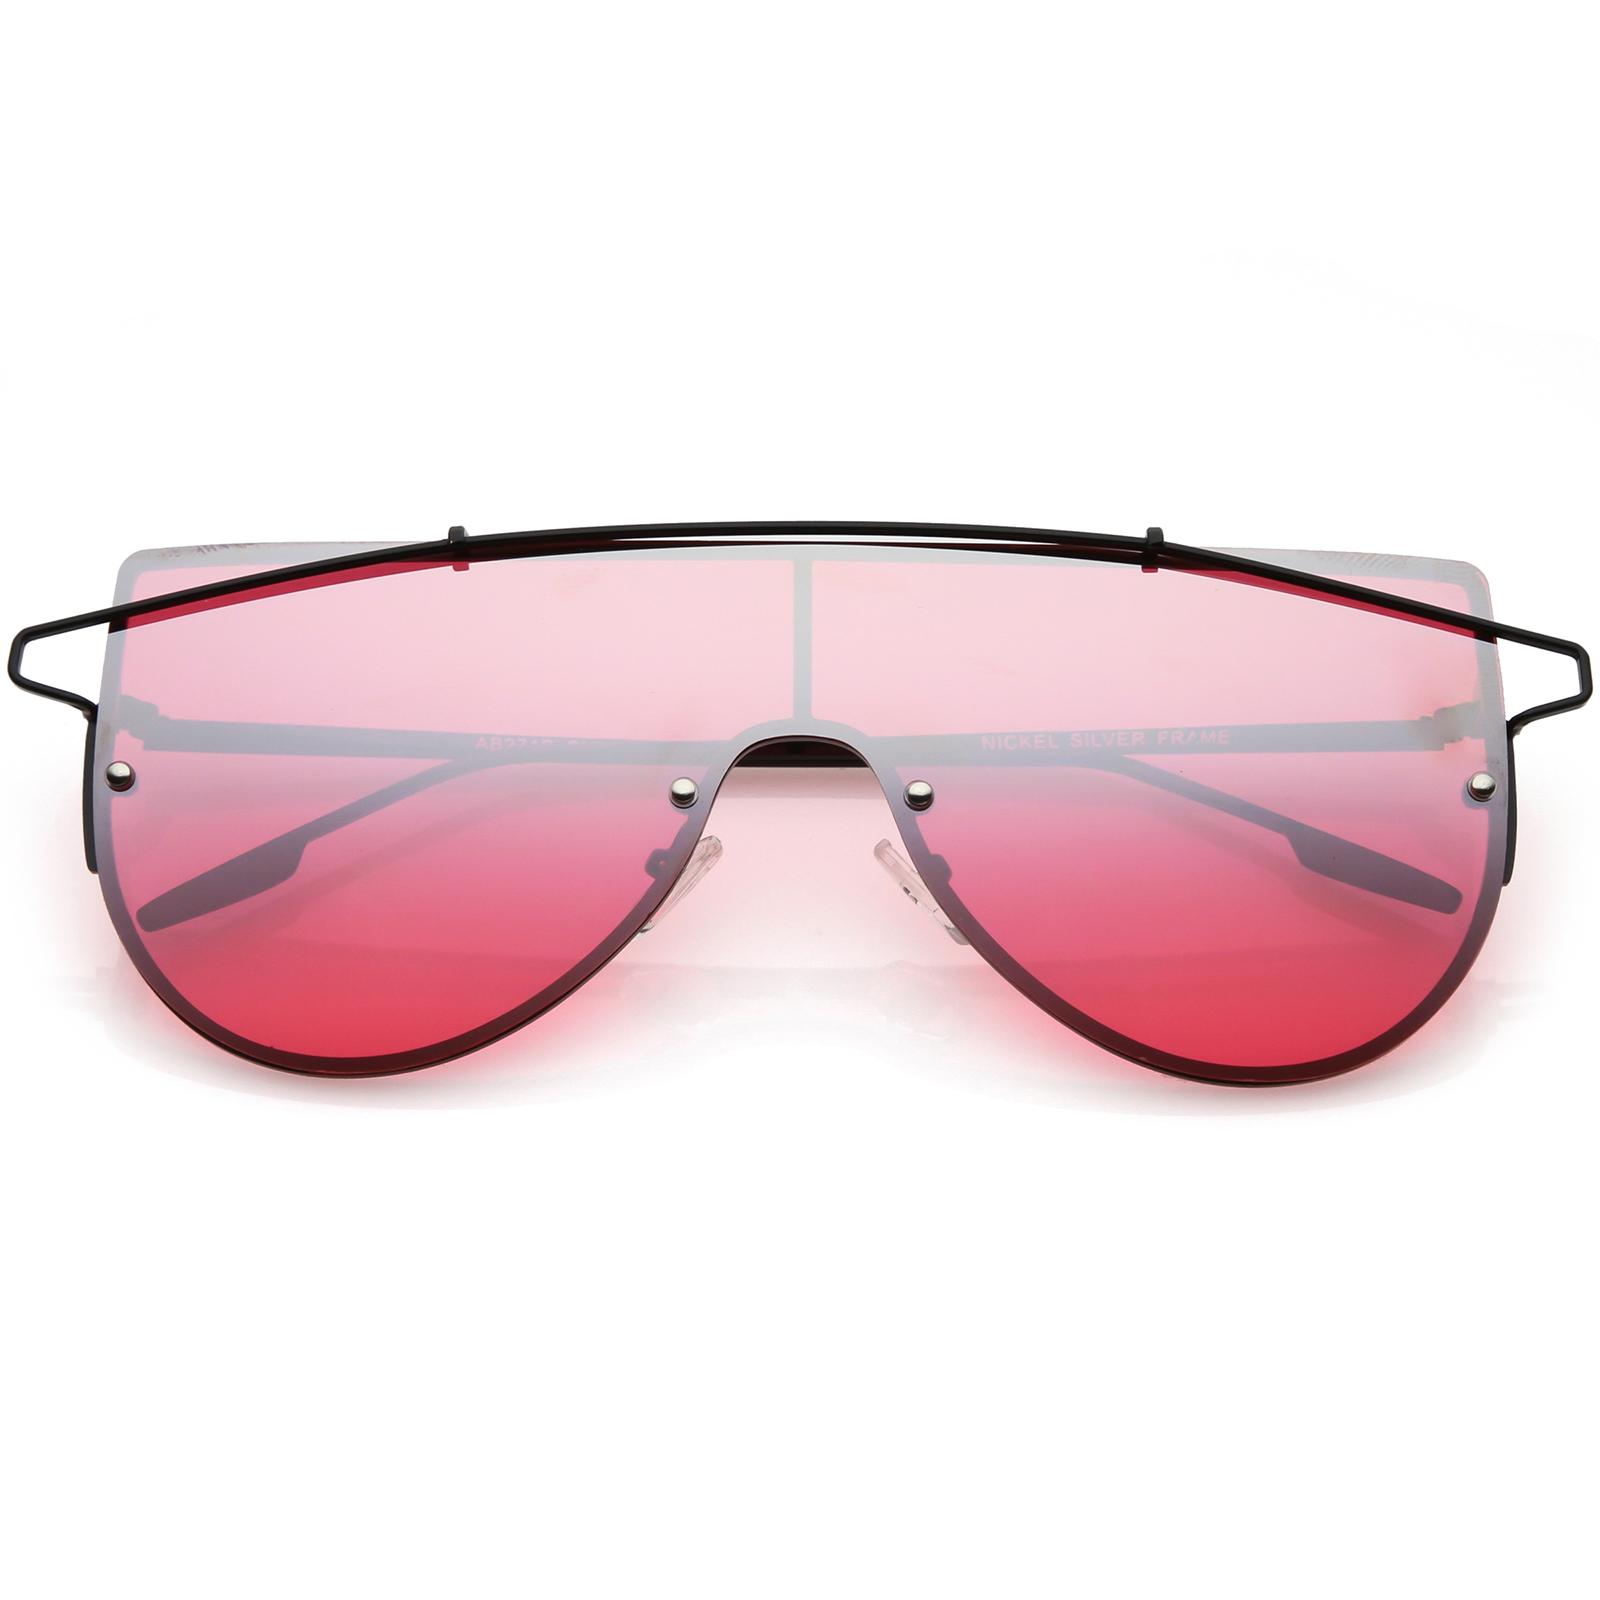 sunglass.la futuristas Montura Al Aire Gafas de sol metal ...